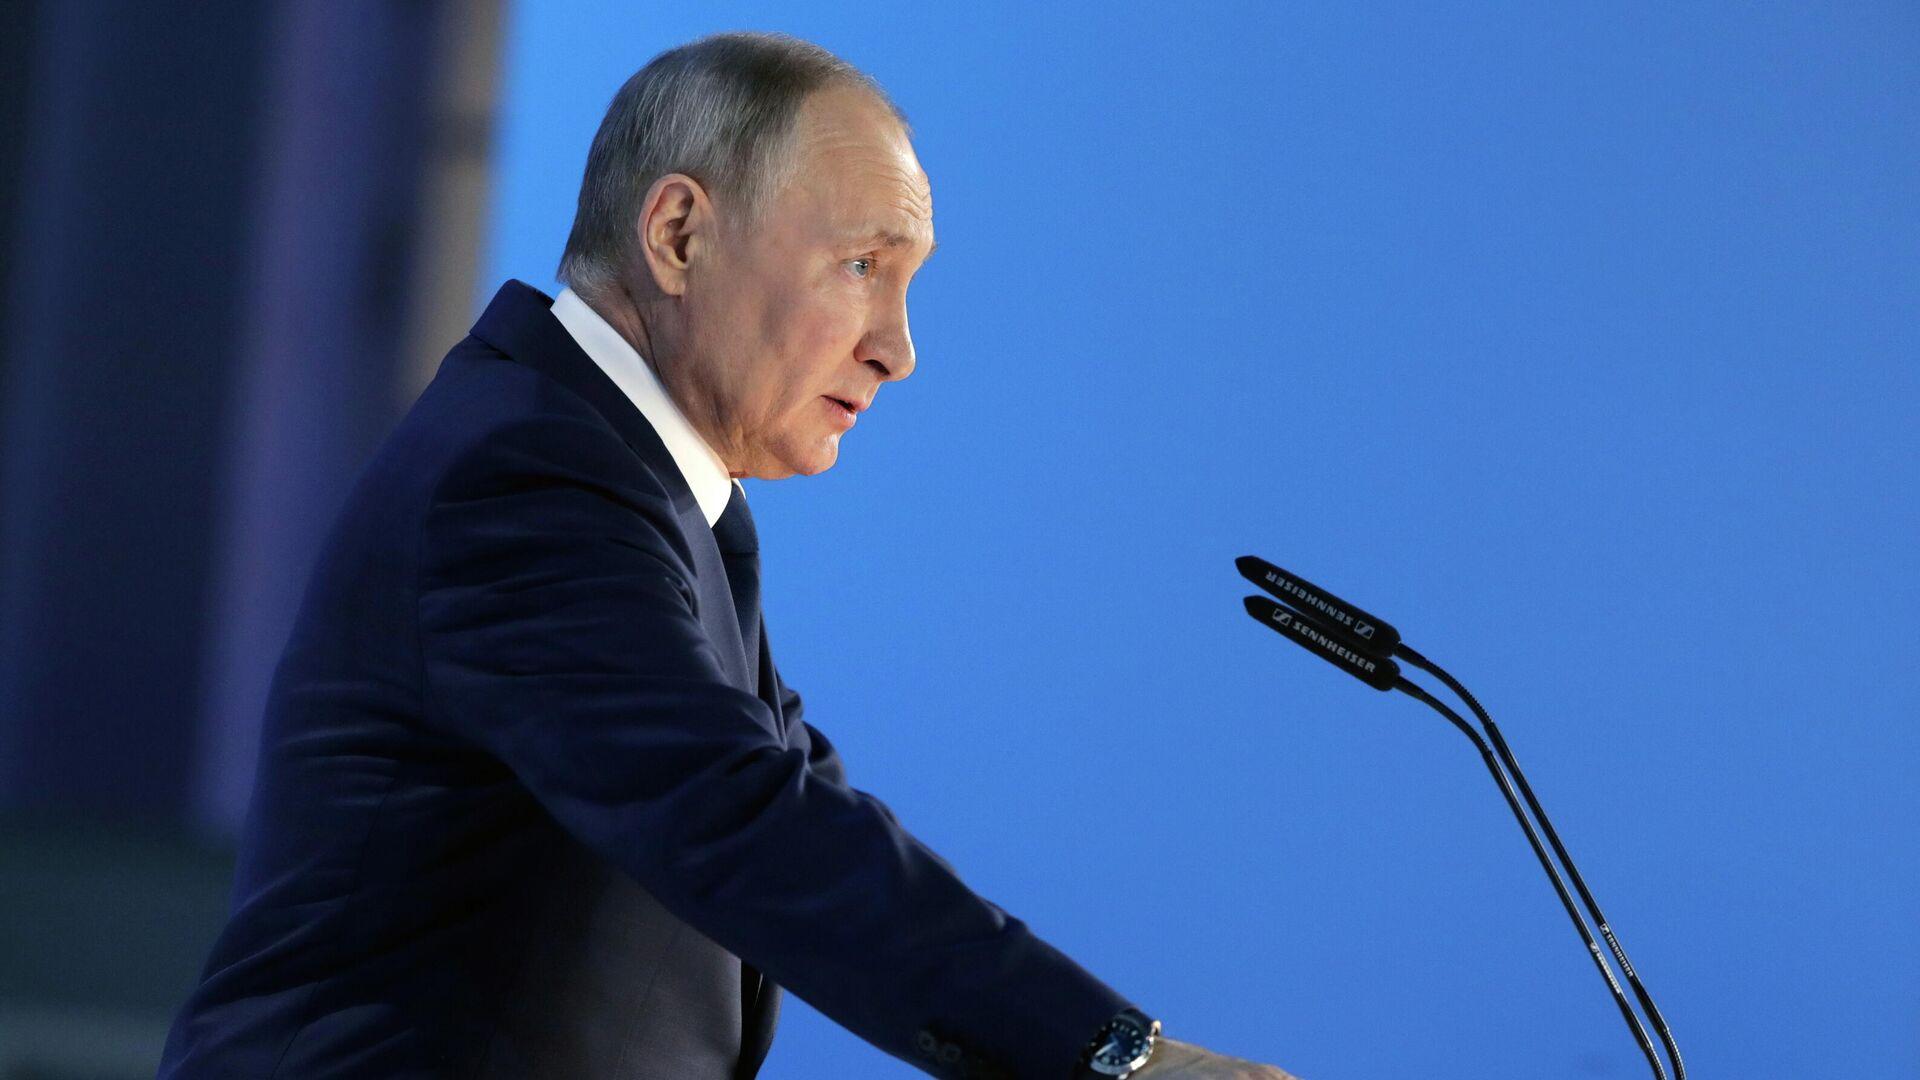 El presidente de Rusia, Vladímir Putin, dirige su mensaje anual a la Asamblea Federal - Sputnik Mundo, 1920, 26.04.2021